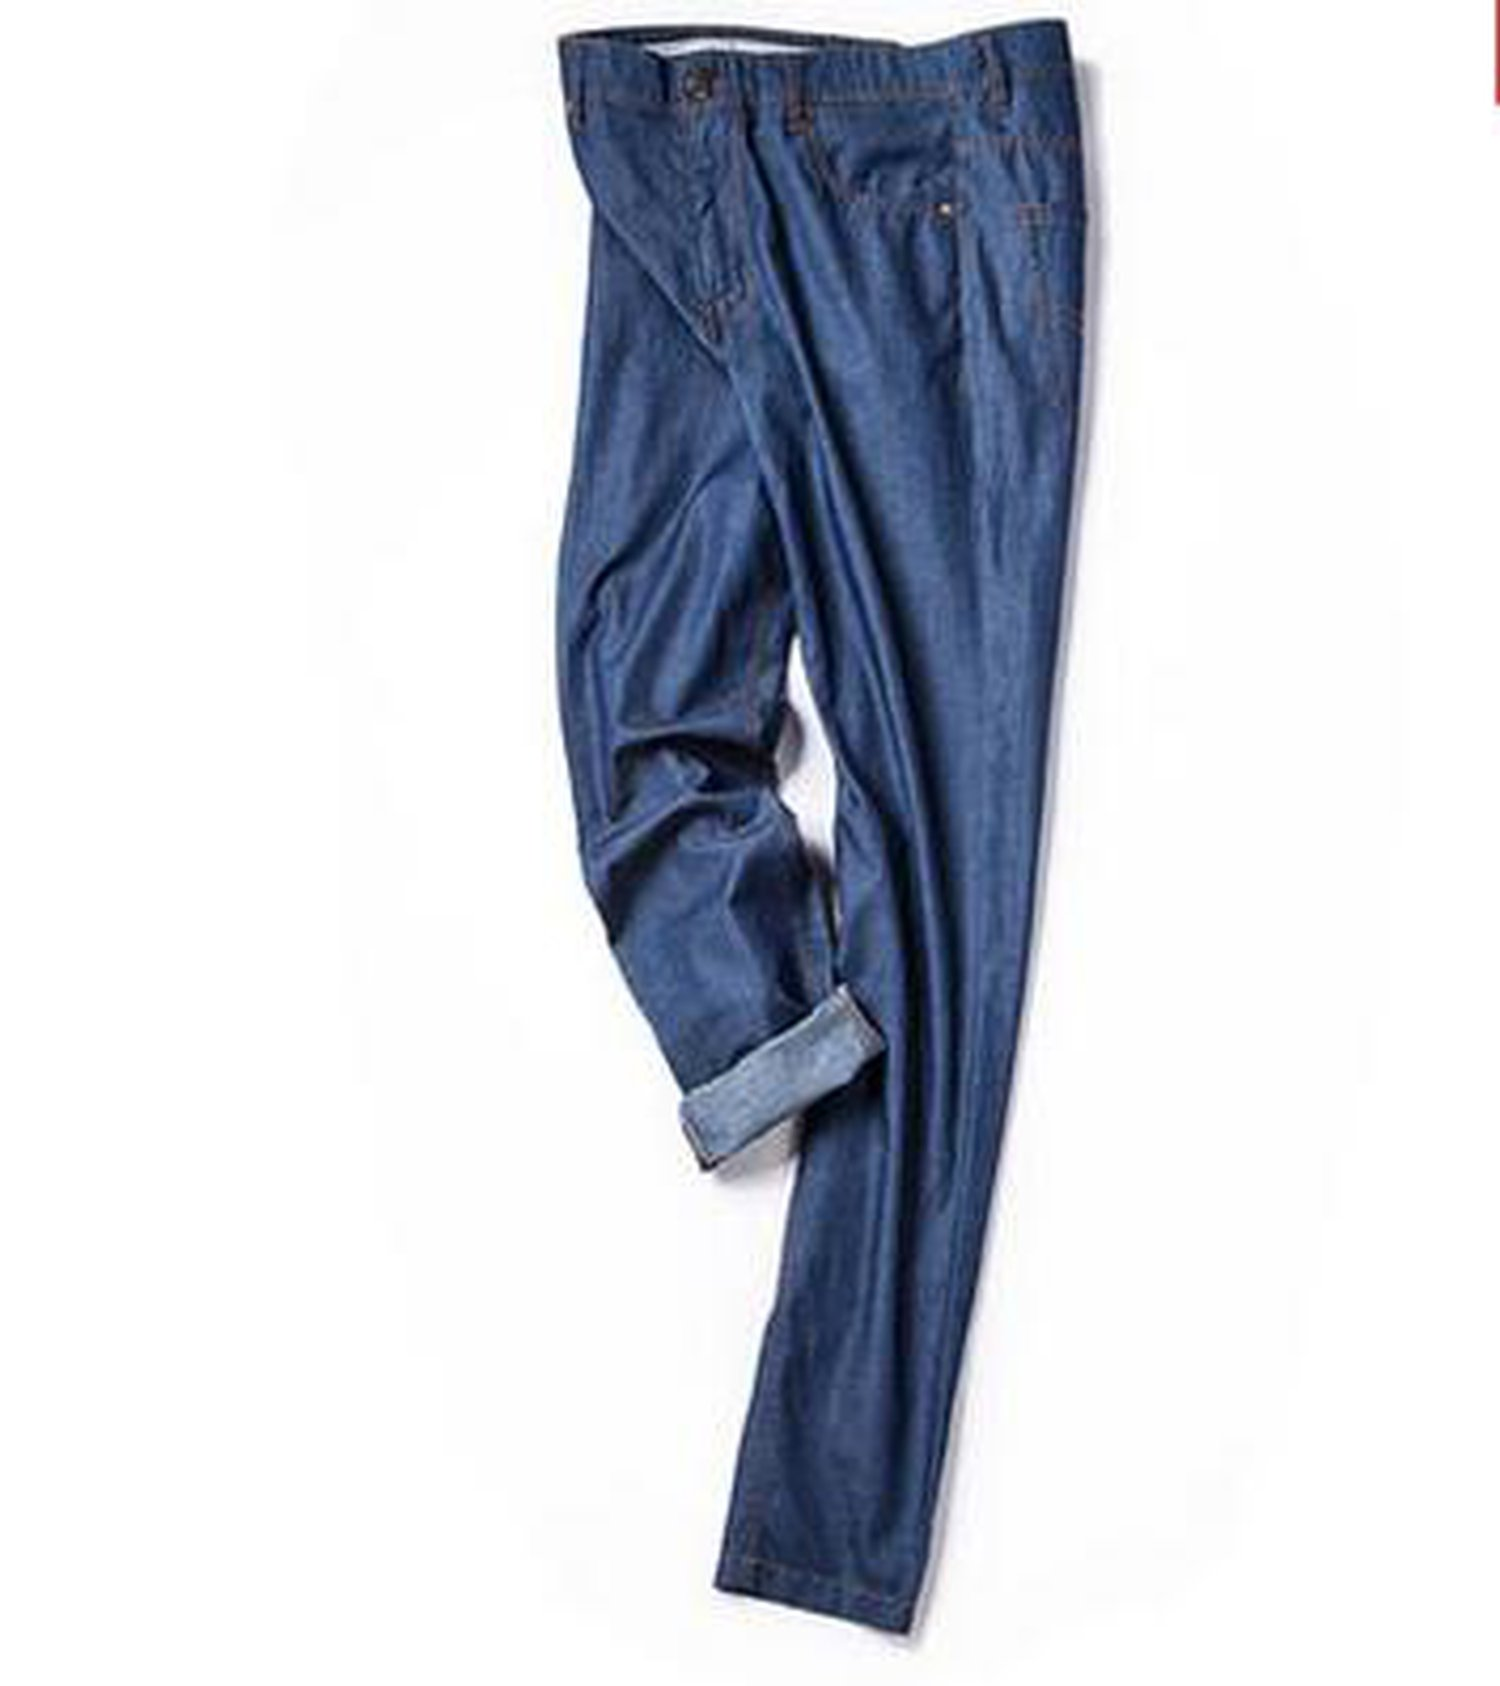 Perfues Men Jeans Fashion Casual Fine Fresh Breathable Cotton Skinny Jeans Pants,Blue,34